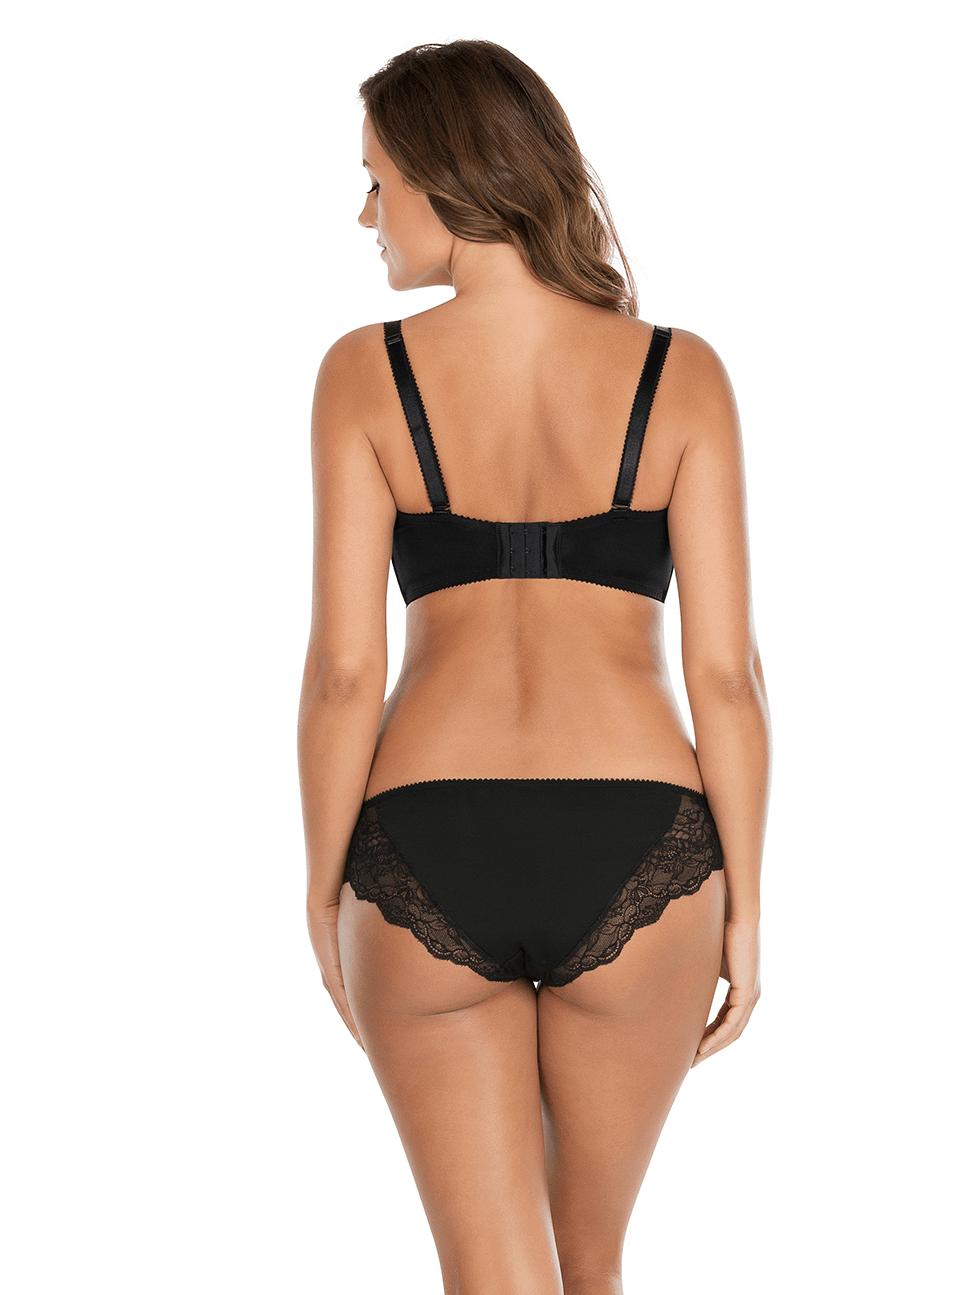 Elissa ContourUnderwireBraP5011 BikiniP5013 Black Back - Elissa Strapless Bra - Black - P5011